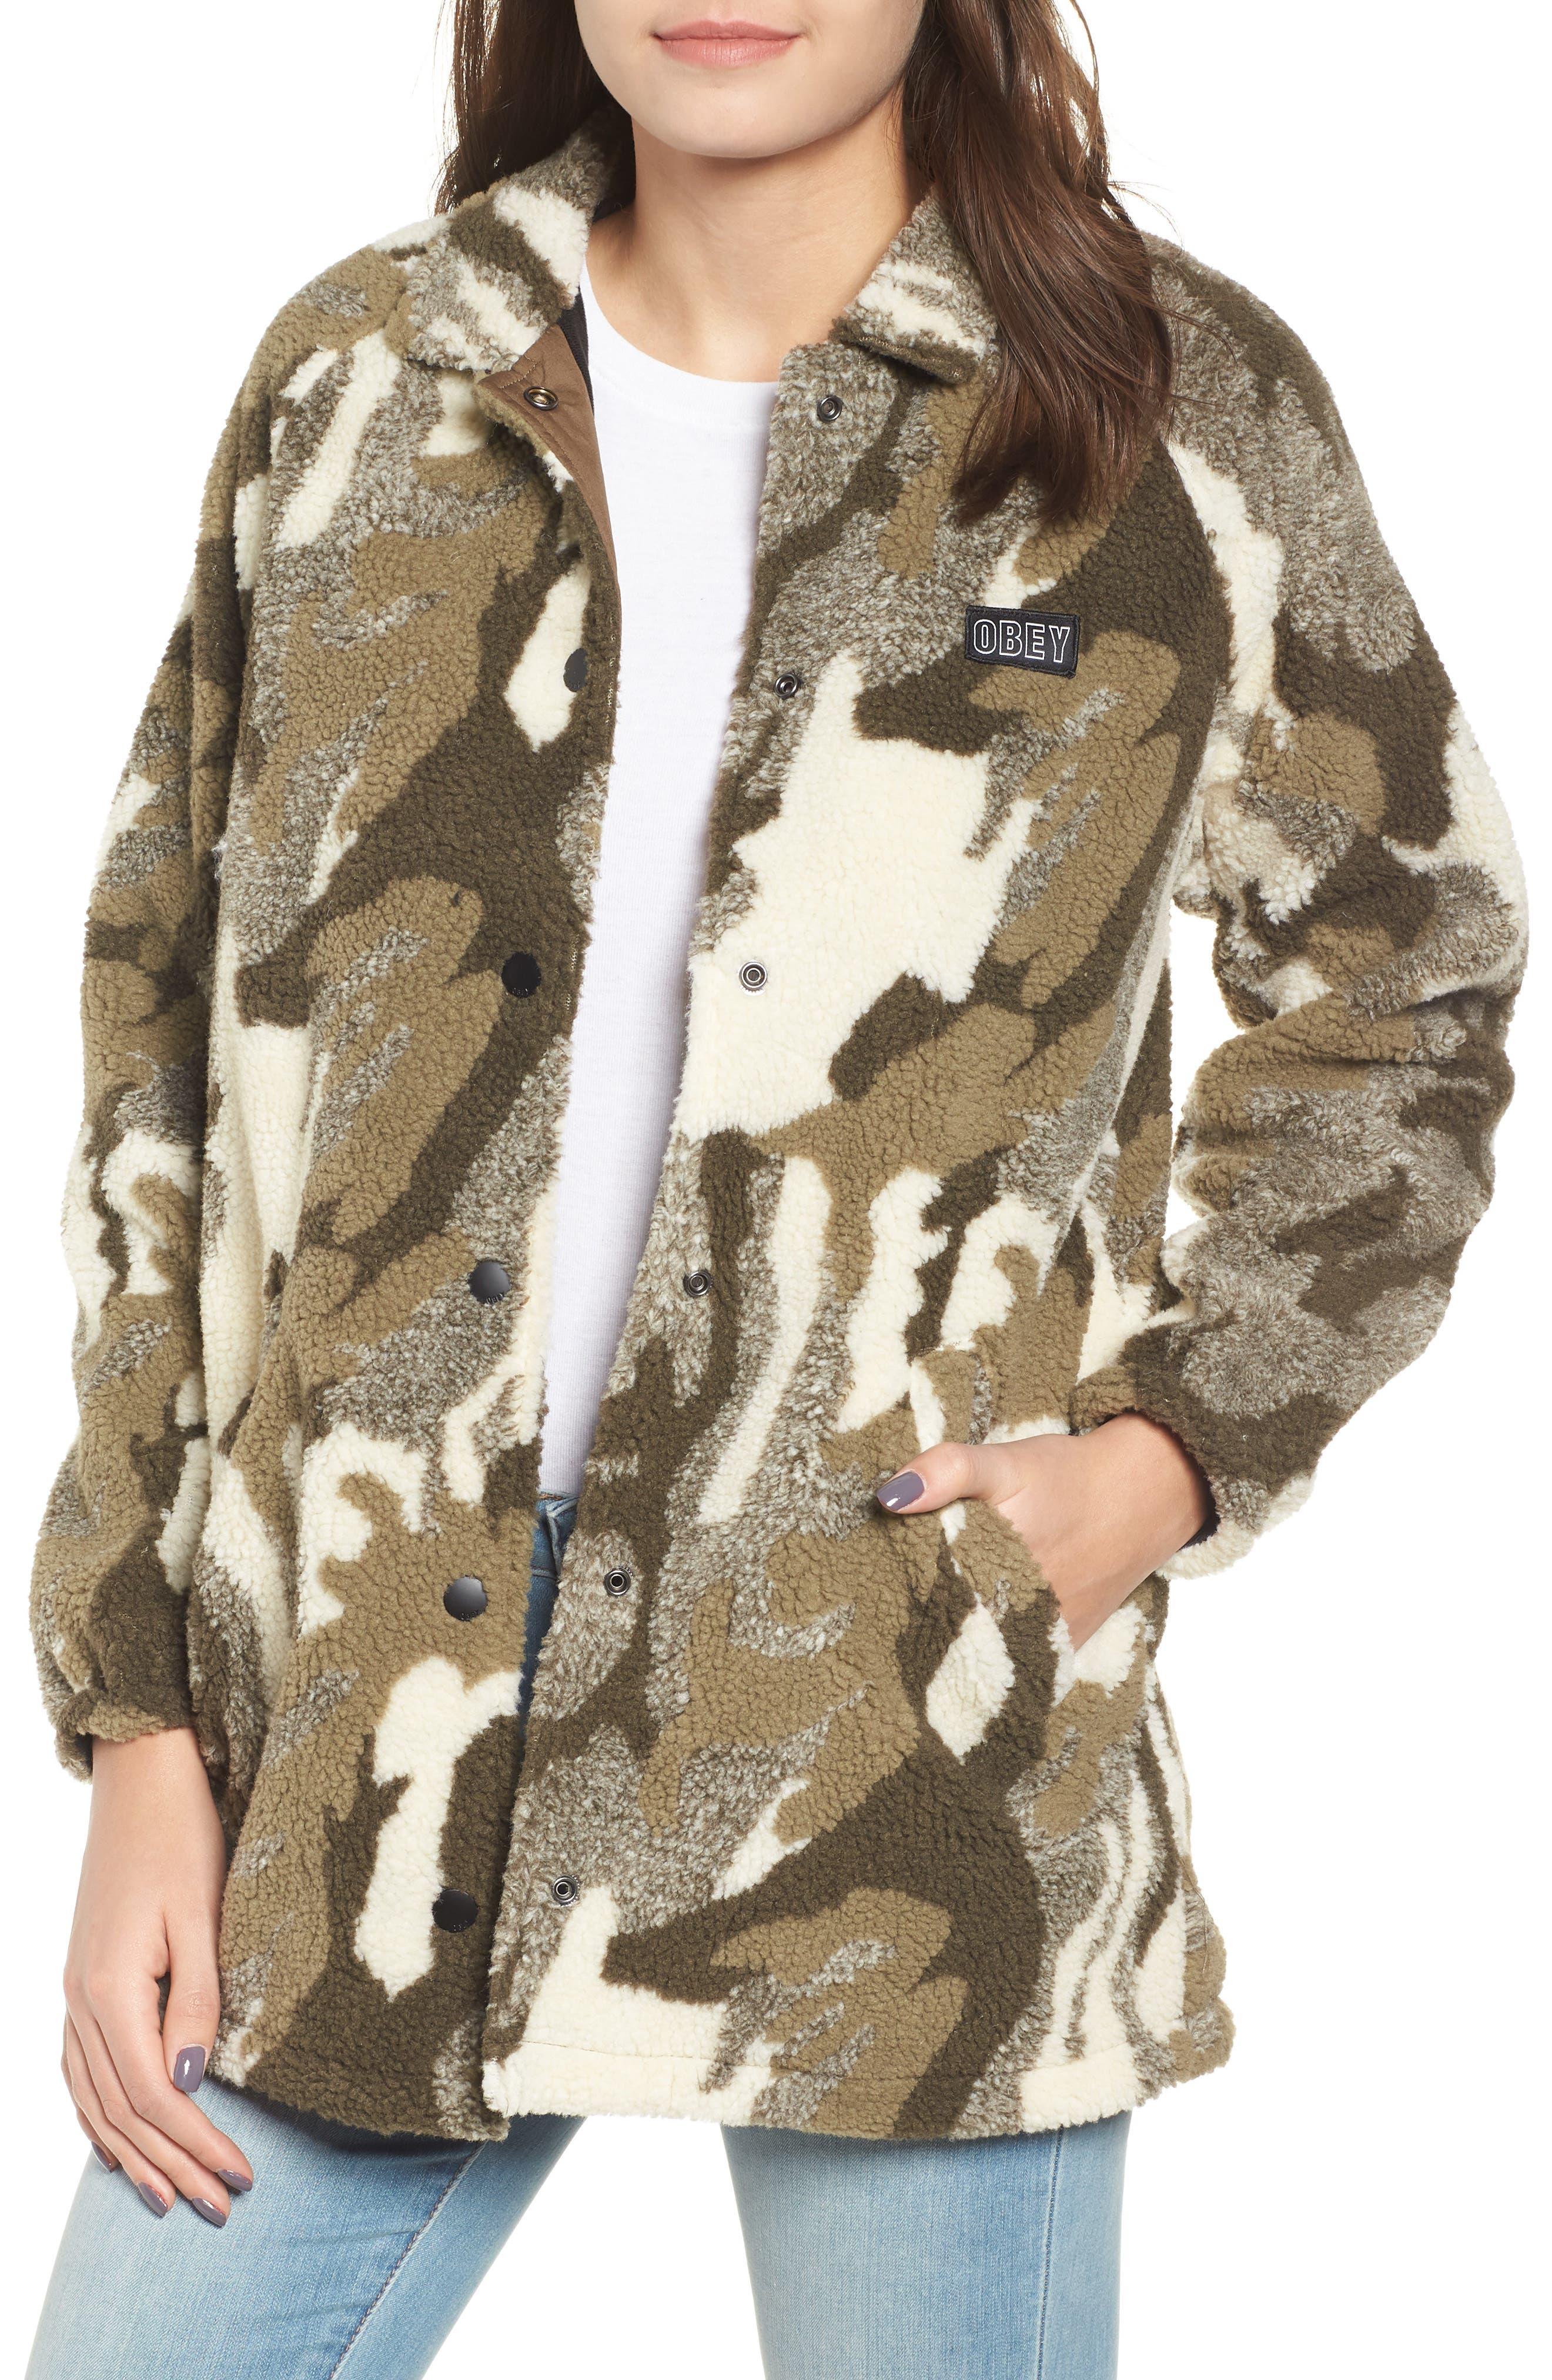 OBEY Covert Fleece Jacket in Camo